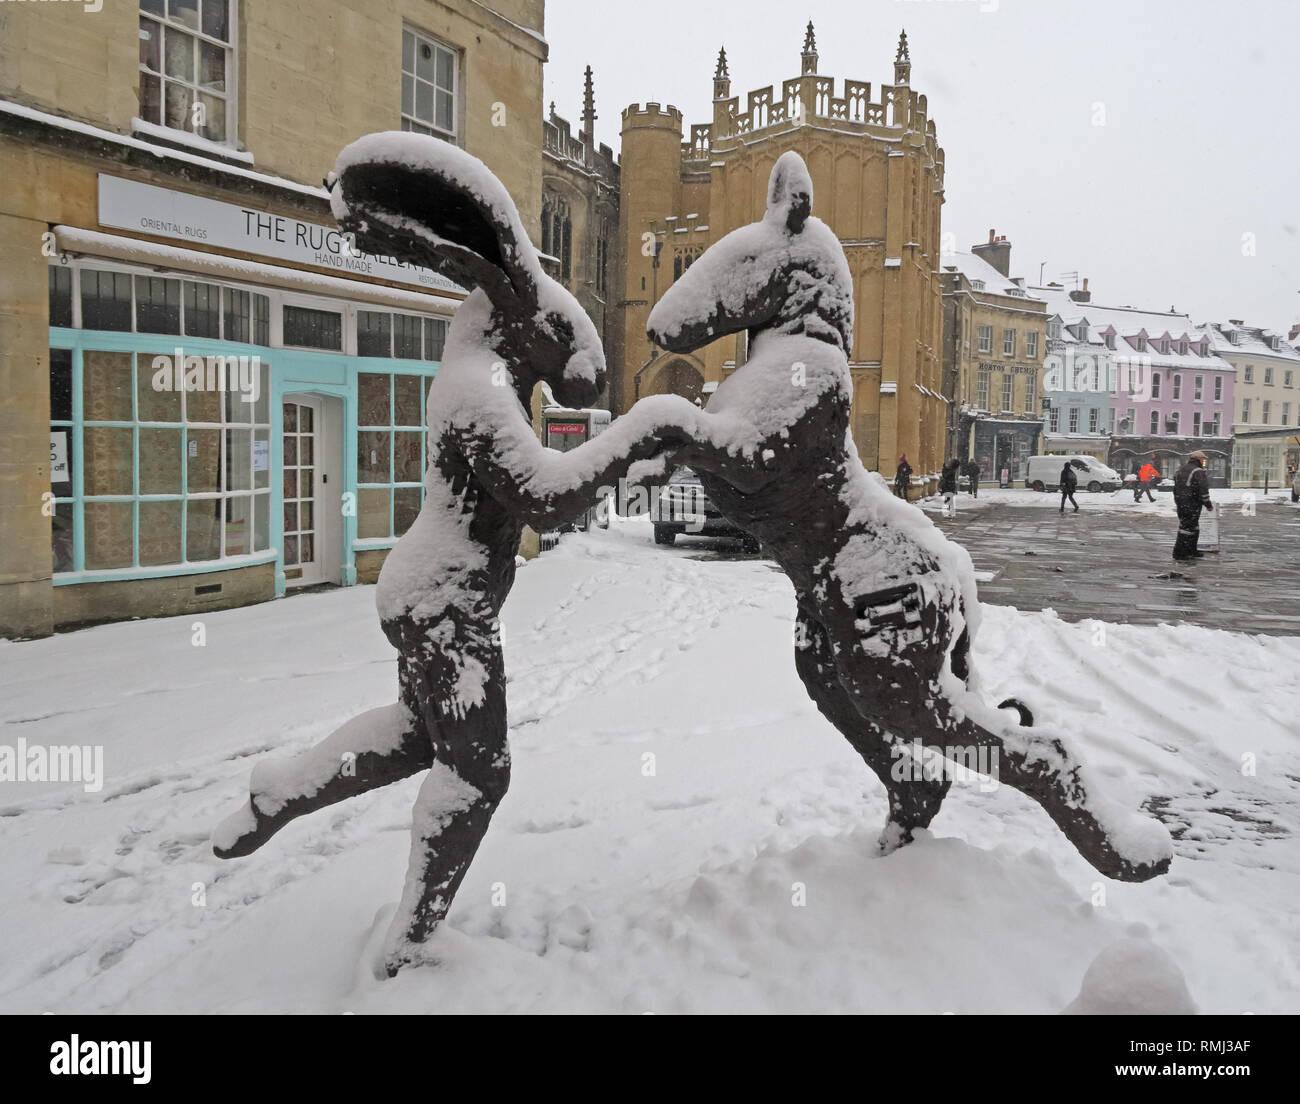 @HotpixUK,HotpixUK,GoTonySmith,England,UK,snow,cold weather,winter,weather,Christmas,card,scene,cold,colder,tourist,tourism,travel,Oxfordshire,market,town,centre,in winter,Roman,stone,buildings,architecture,Cotswold Architecture,Cotswolds,Cotswold,South West England,Corinium,GL7,artist,rabbit sculpture,rabbits,Lady-Hare,ears,rabbits ears,Market Place